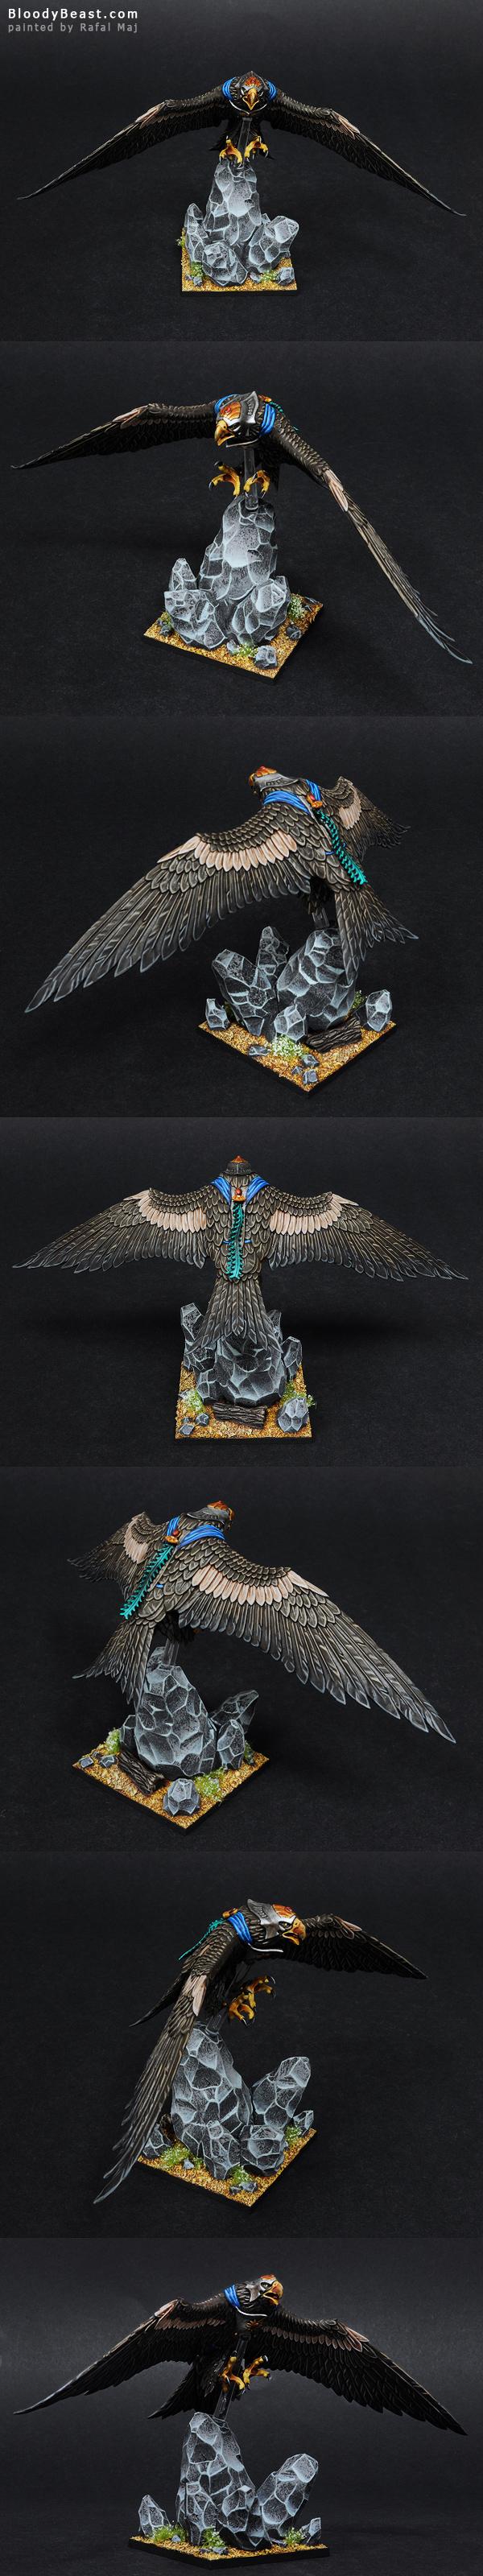 High Elf Great Eagle painted by Rafal Maj (BloodyBeast.com)